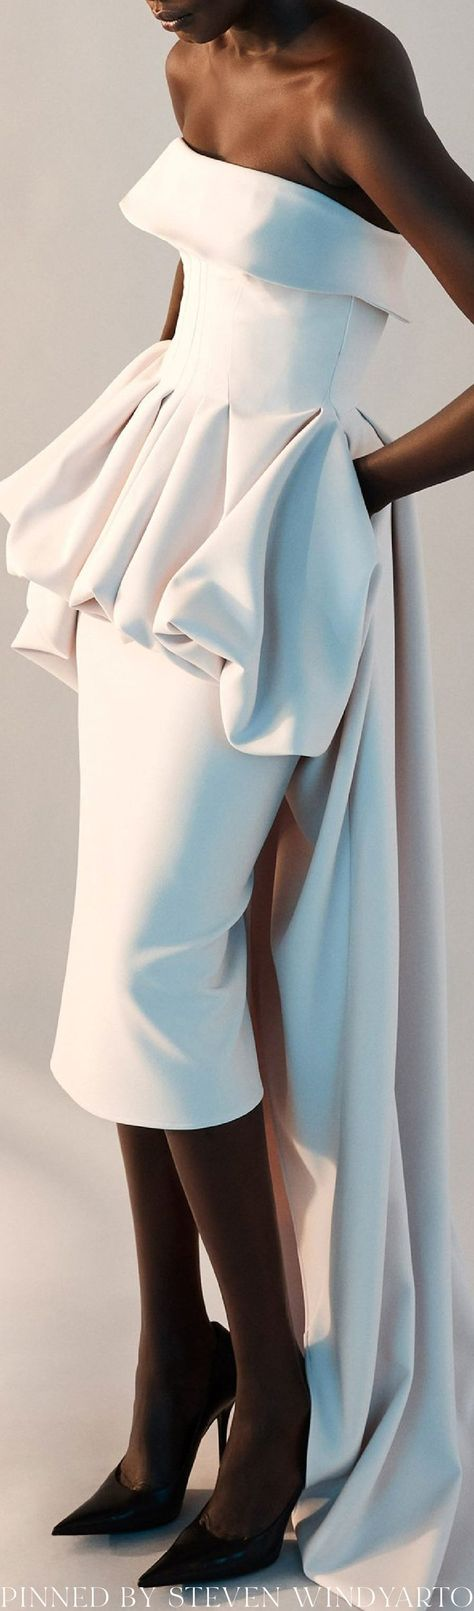 Maticevski Spring 2022 Lookbook - Situational Strapless Midi Gown #spring2022 #ss22 #womenswear #tonimatičevski